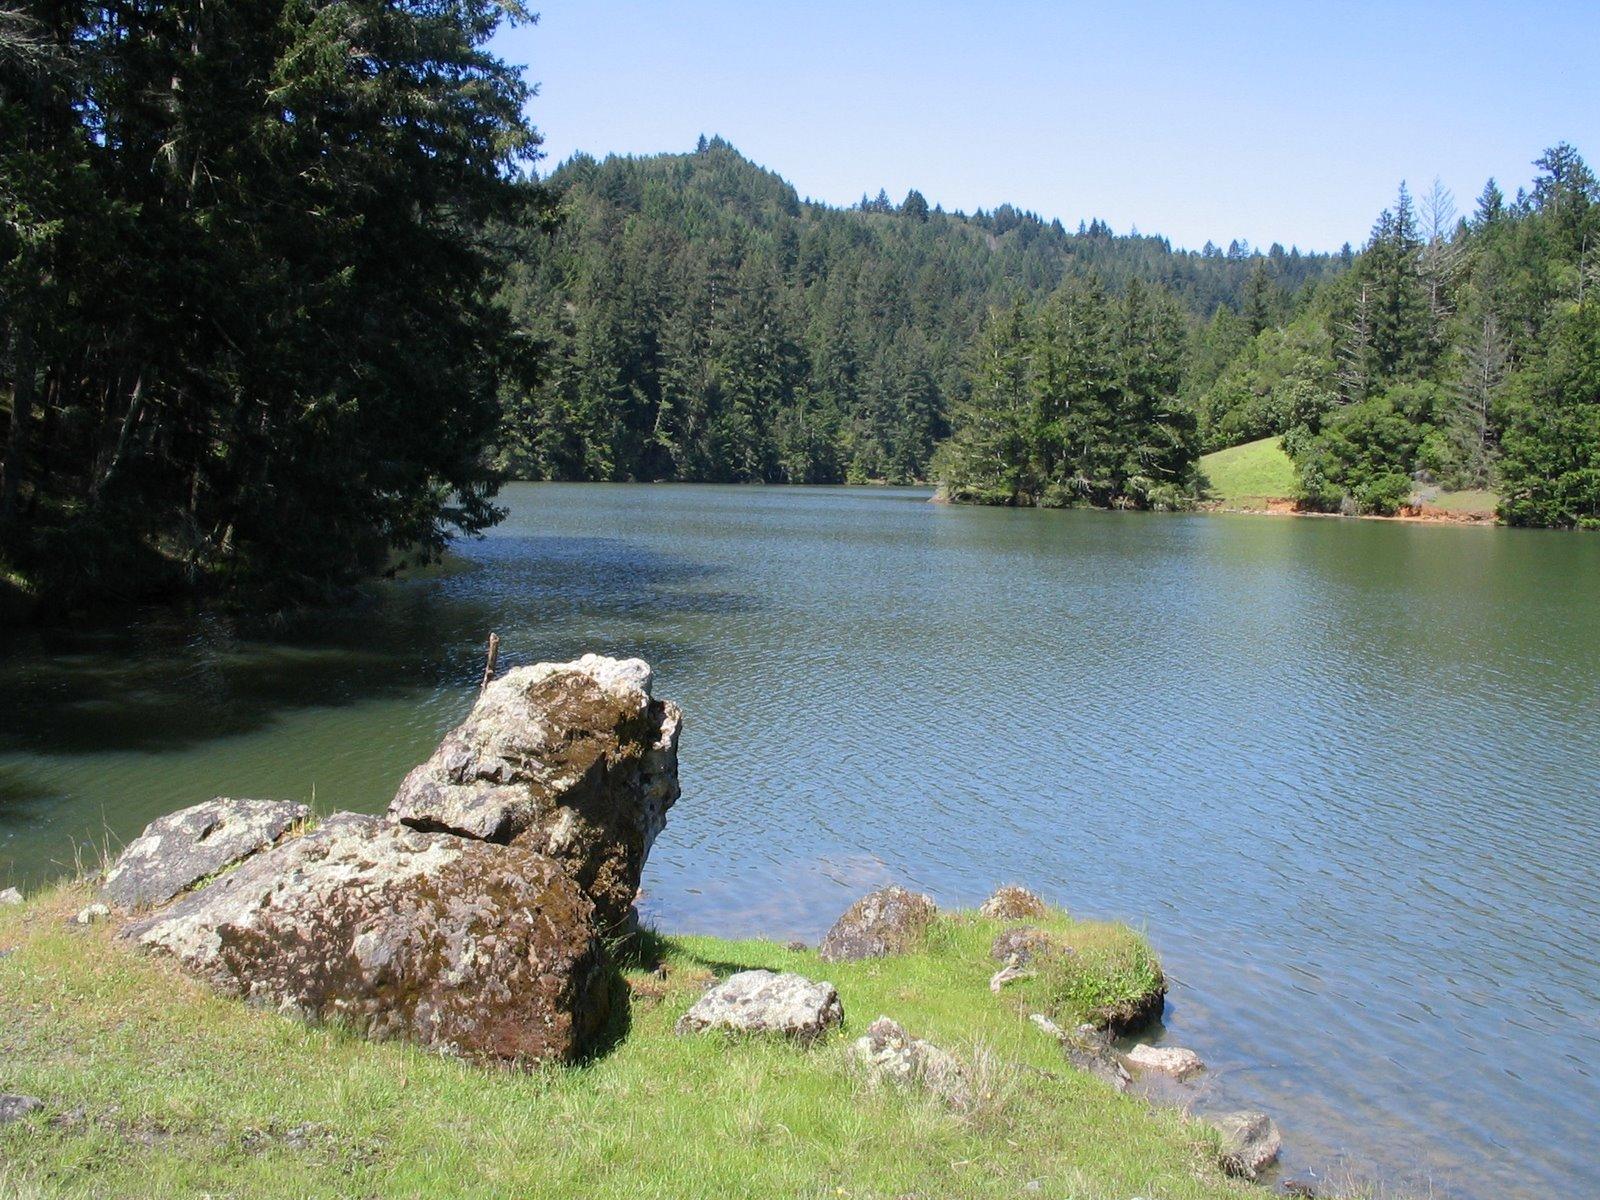 [Kent+Trail+Alpine+Lake+Mt+Tam+017.jpg]